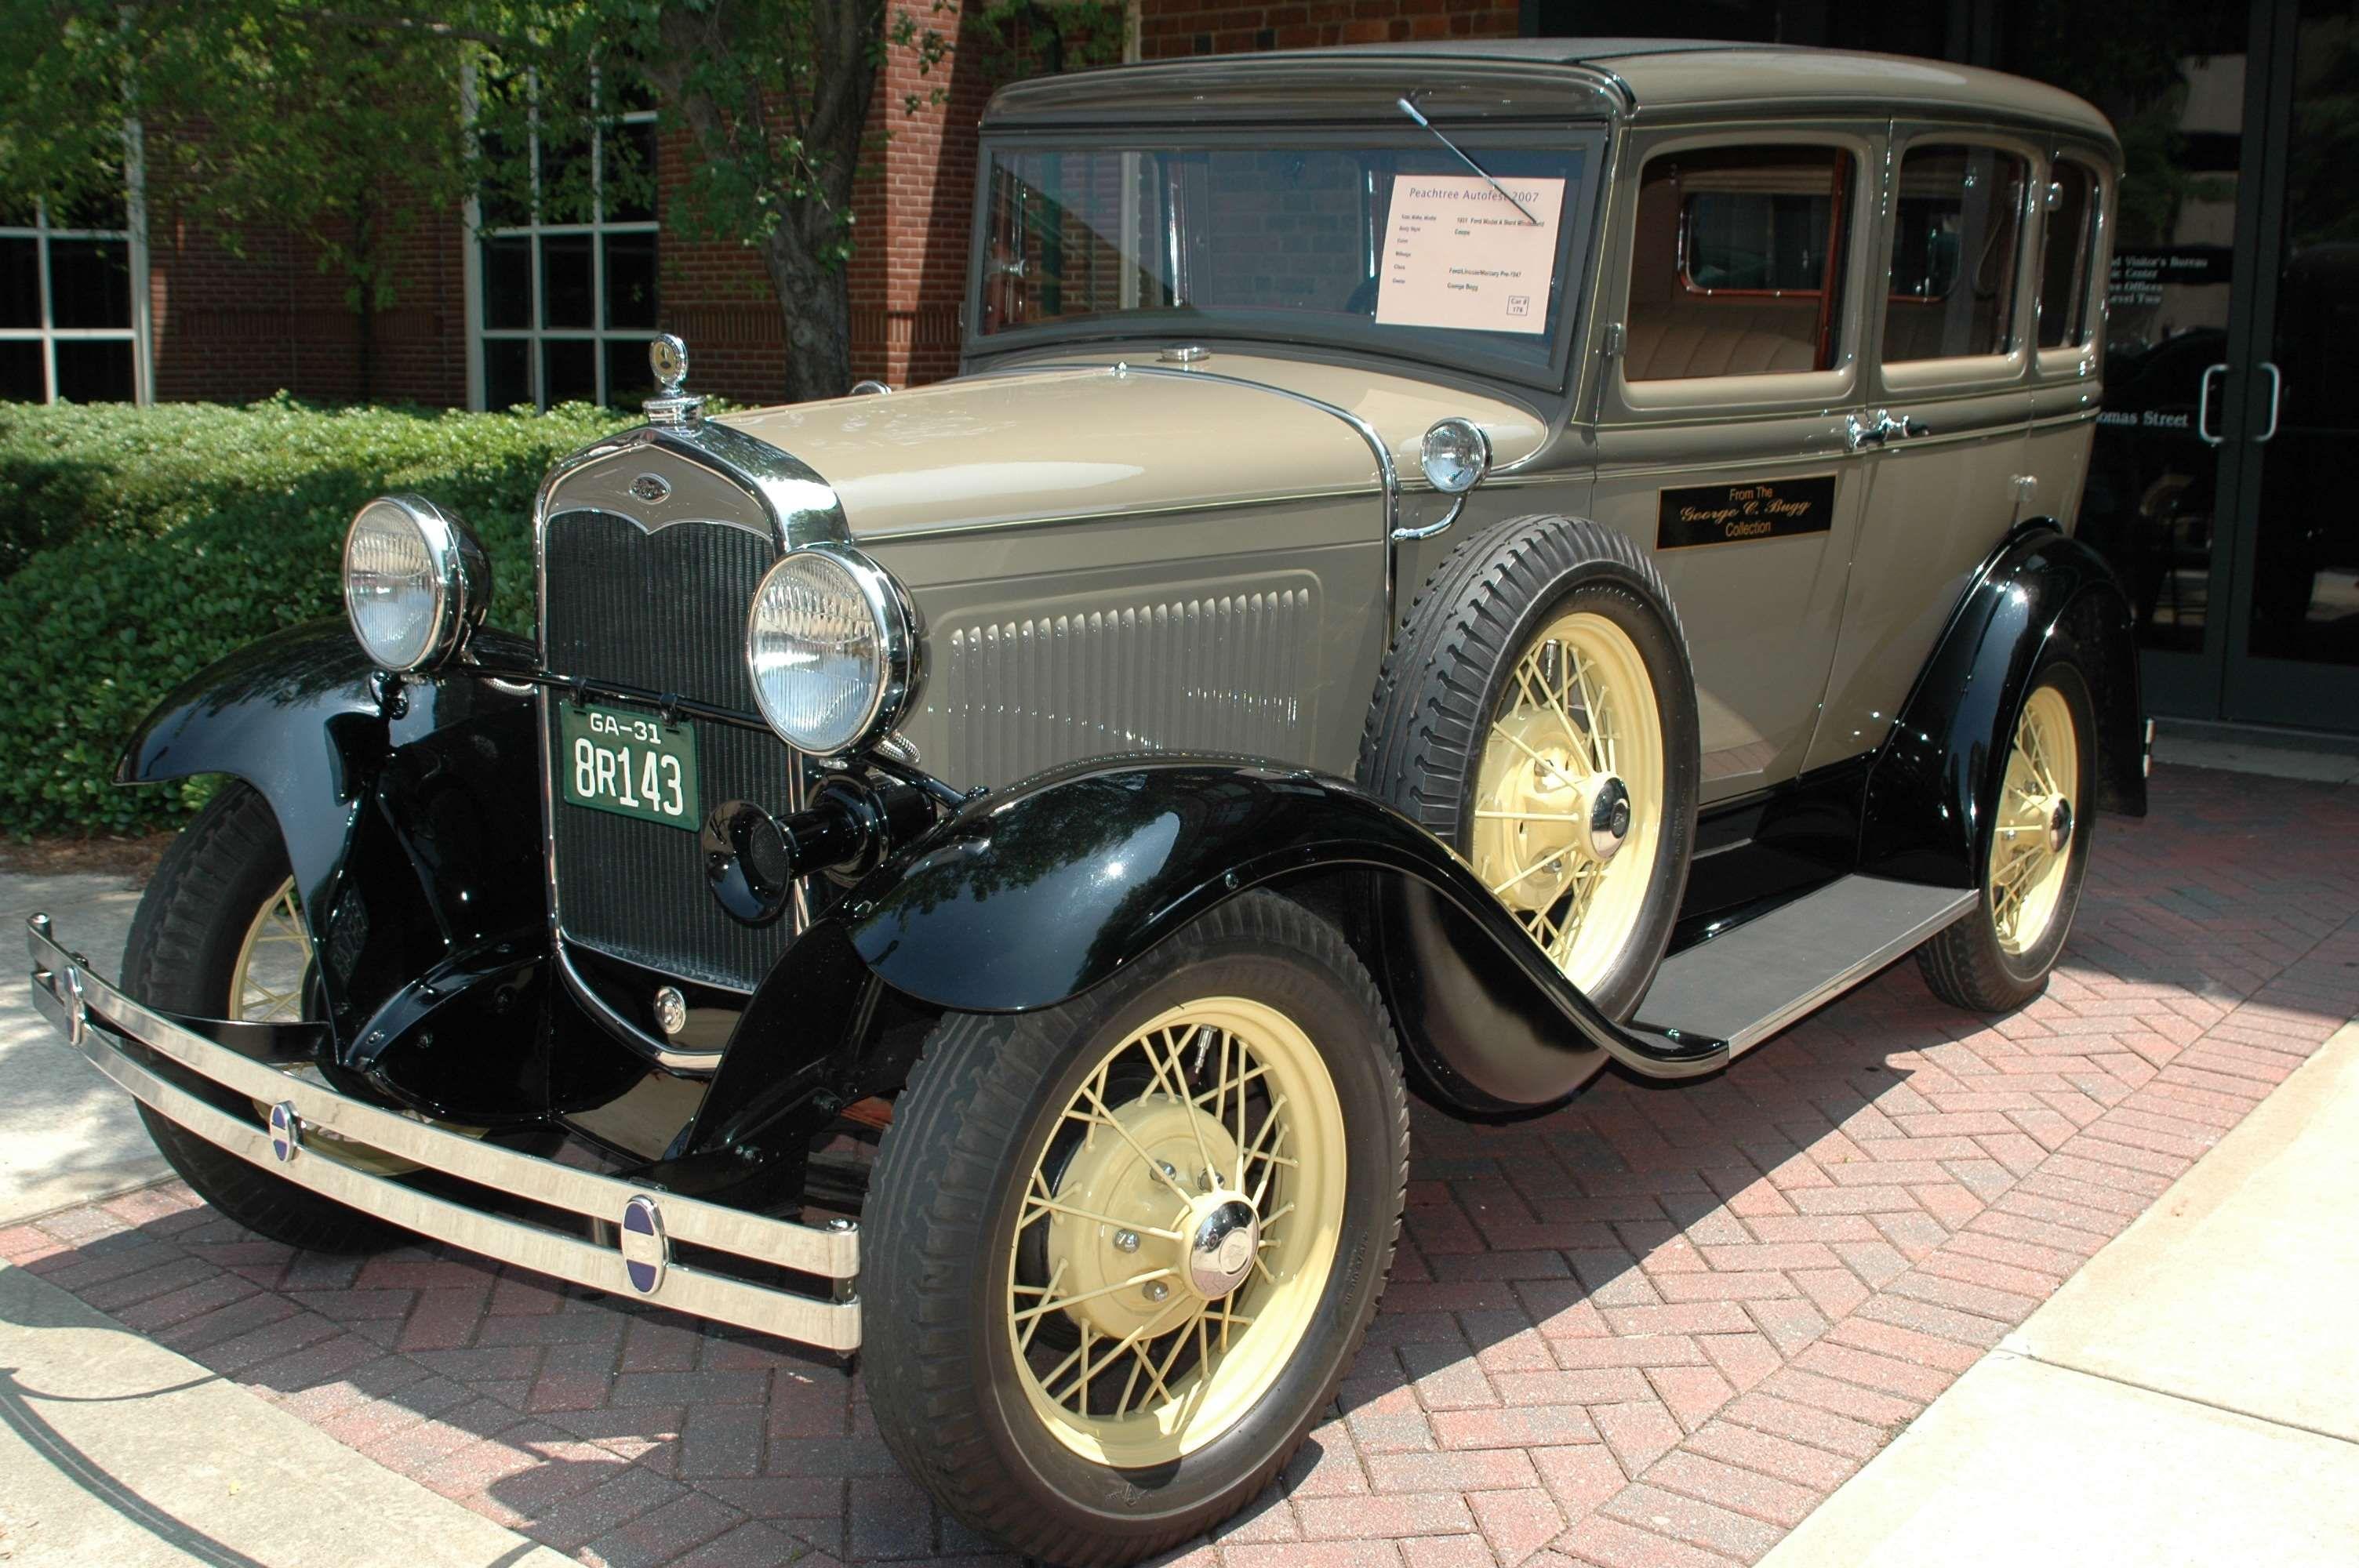 Antique Automobile Automotive Brand Brick Paving Bushes Car Car Show Chrome Classic Con Sports Cars For Sale Muscle Cars For Sale Cars For Sale Used